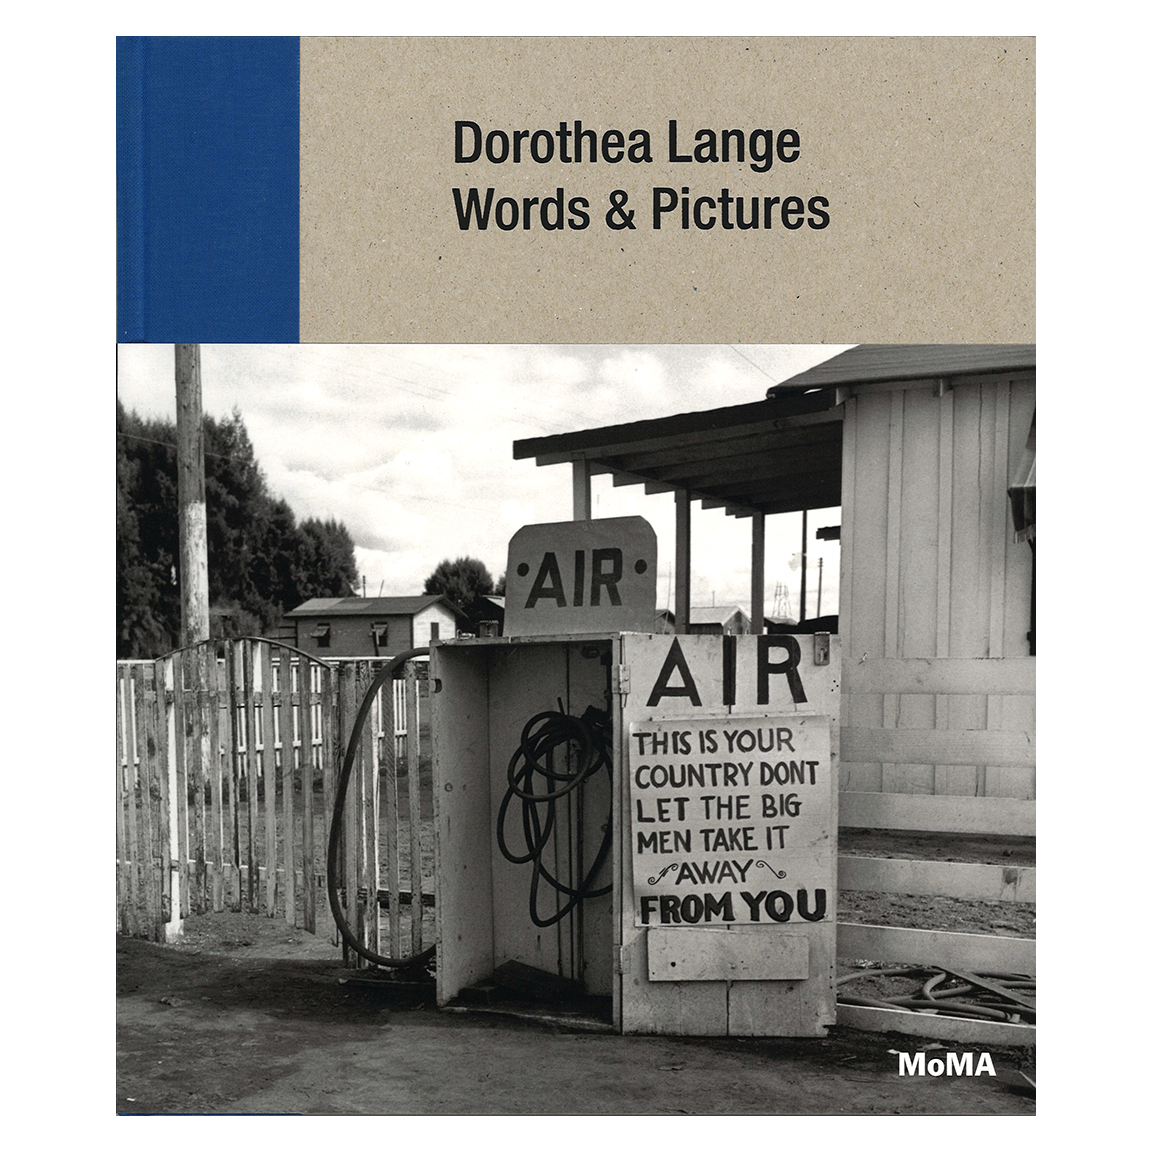 Dorothea Lange - Words & Pictures